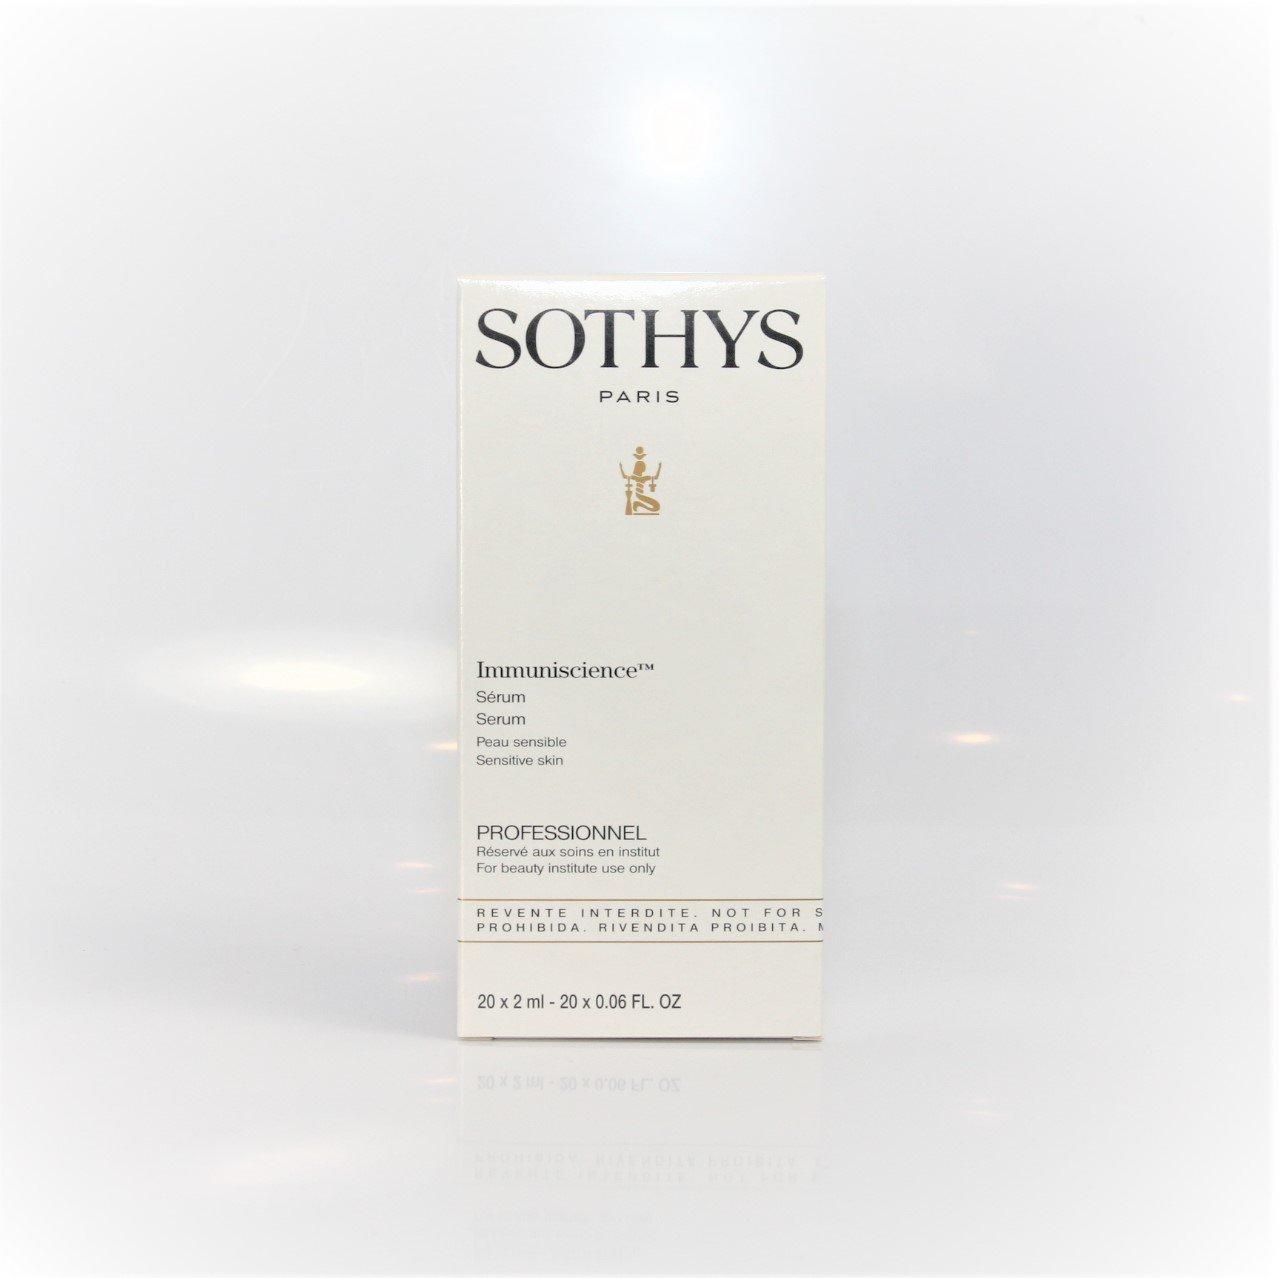 Sothys Immuniscience Serum for Sensitive Skin (2ml/0.06Fl.Oz x 20 ampoule)